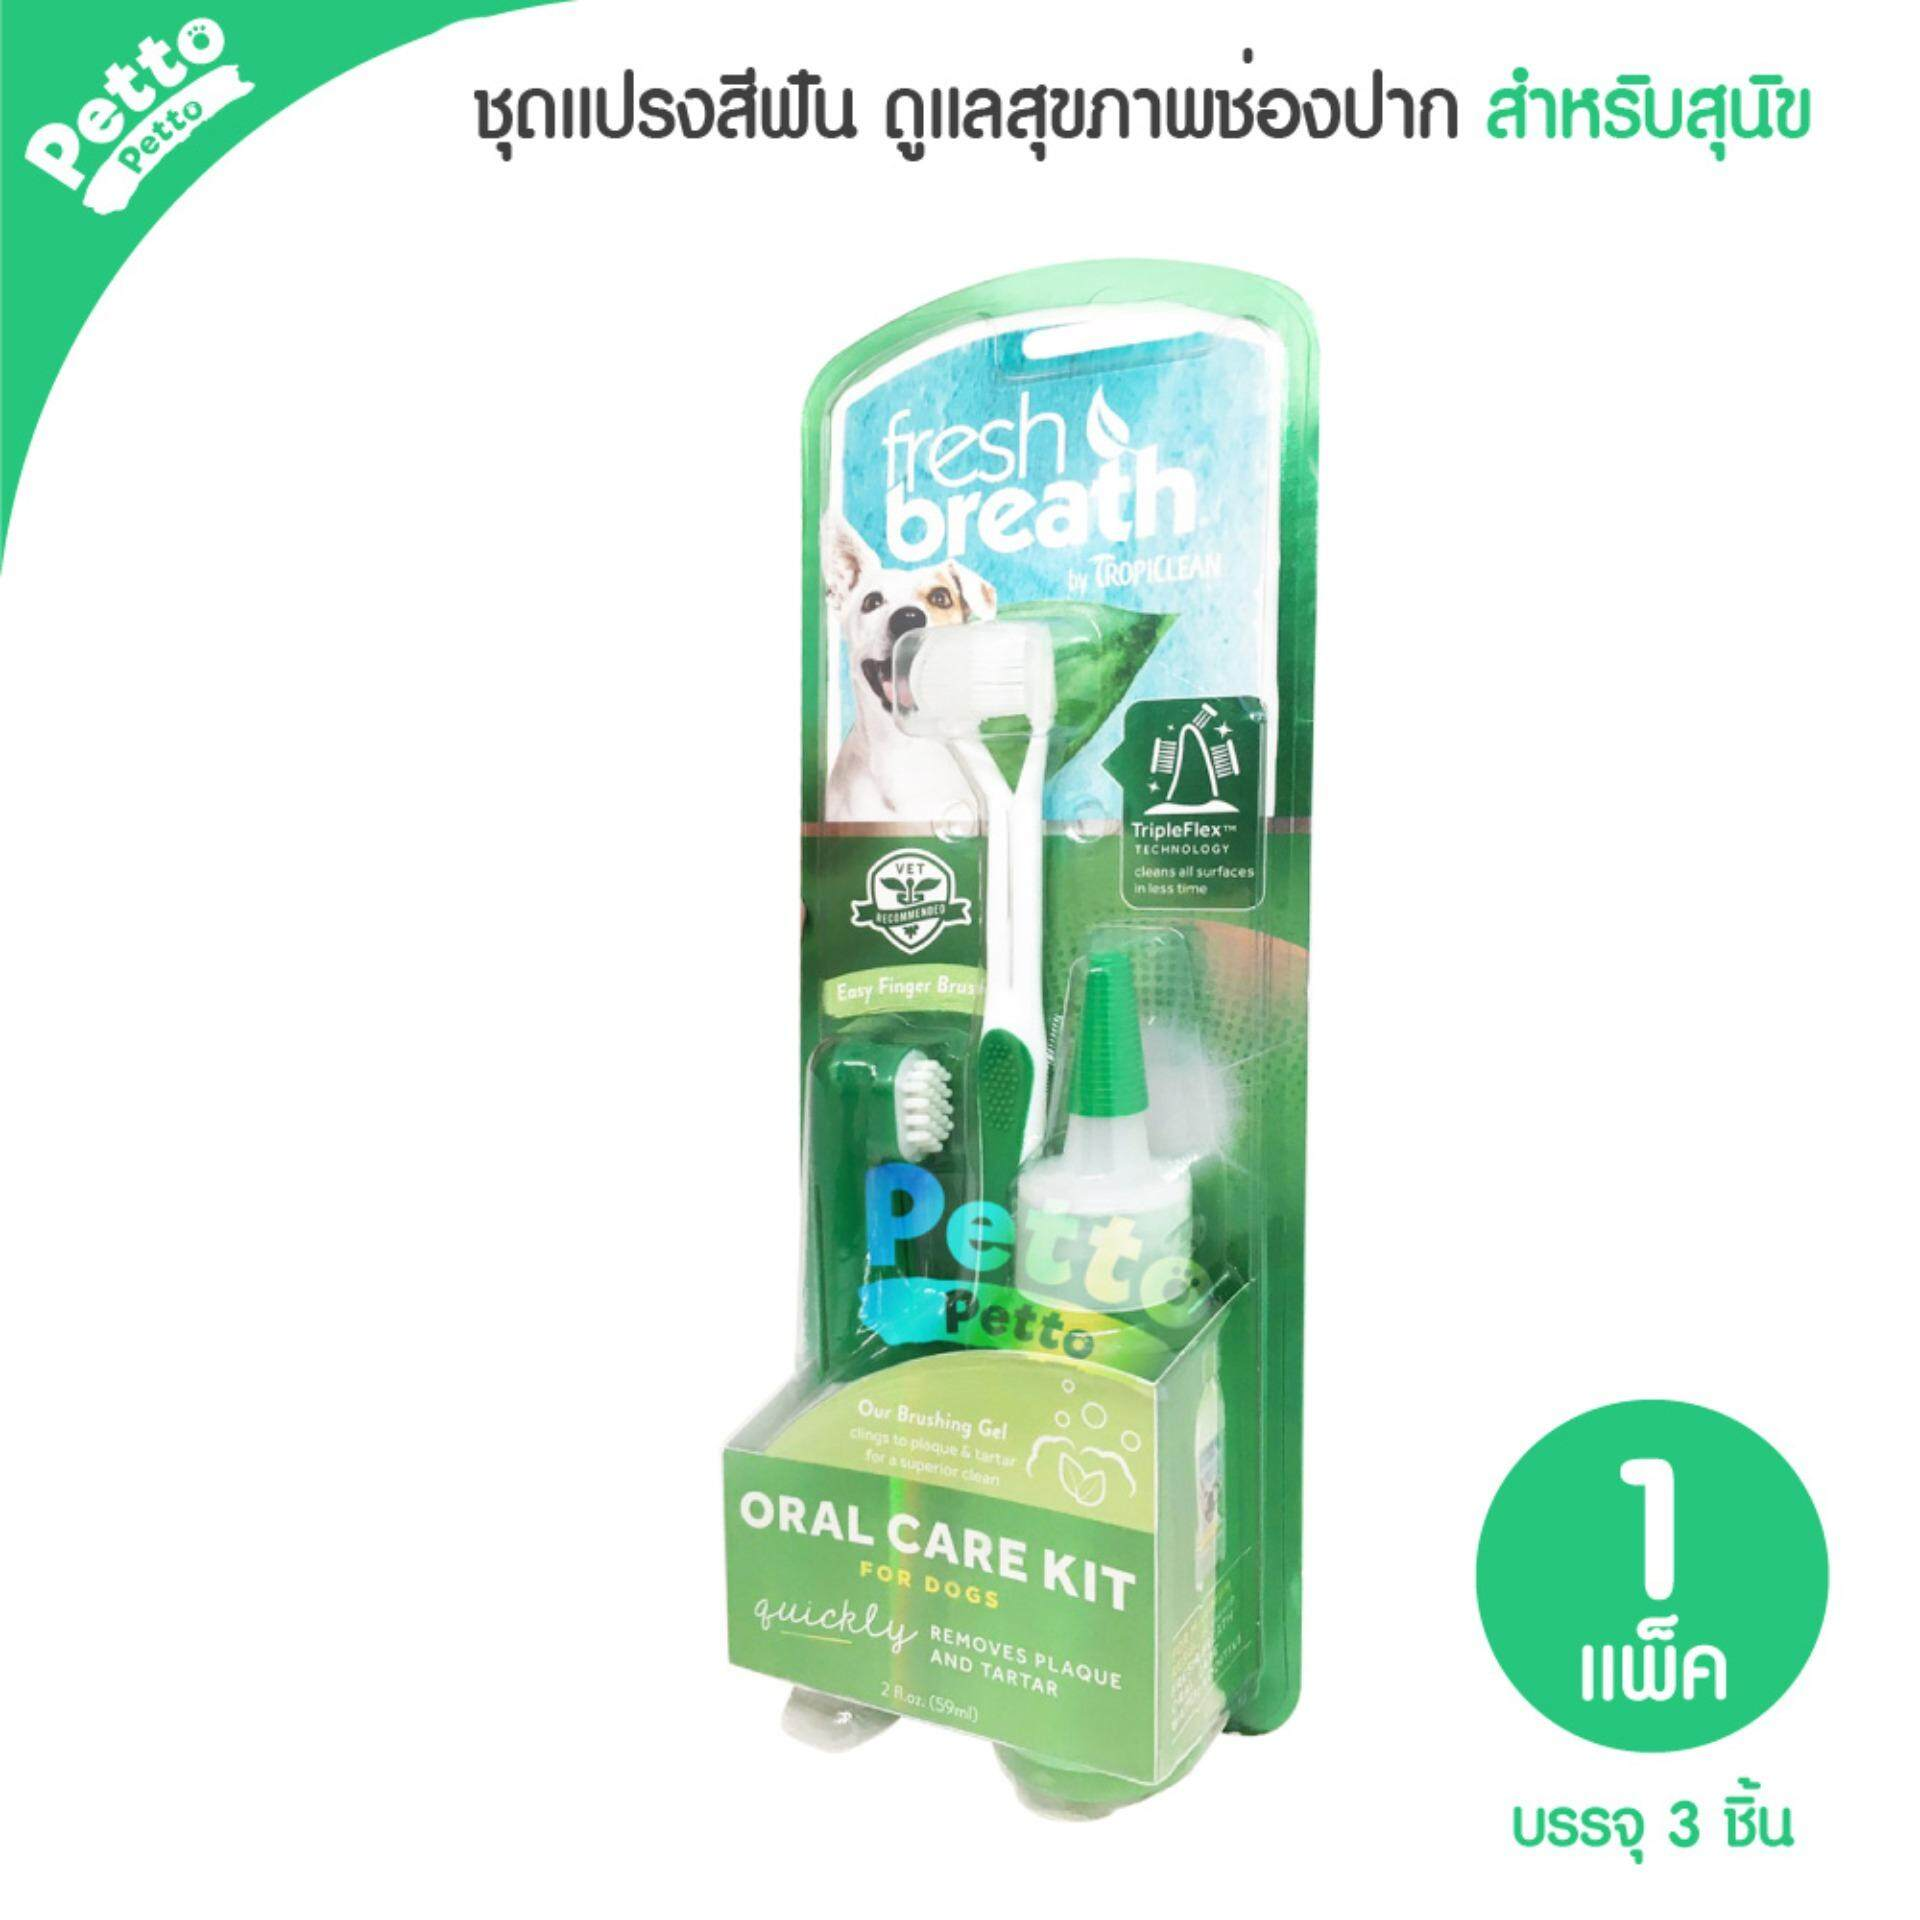 Tropiclean Oral Care Kit ชุดดูแลช่องปาก เจลป้ายฟัน พร้อมแปรงสีฟัน แปรงสวมมือ (3 ชิ้น/แพ็ค) By Petto Petto.